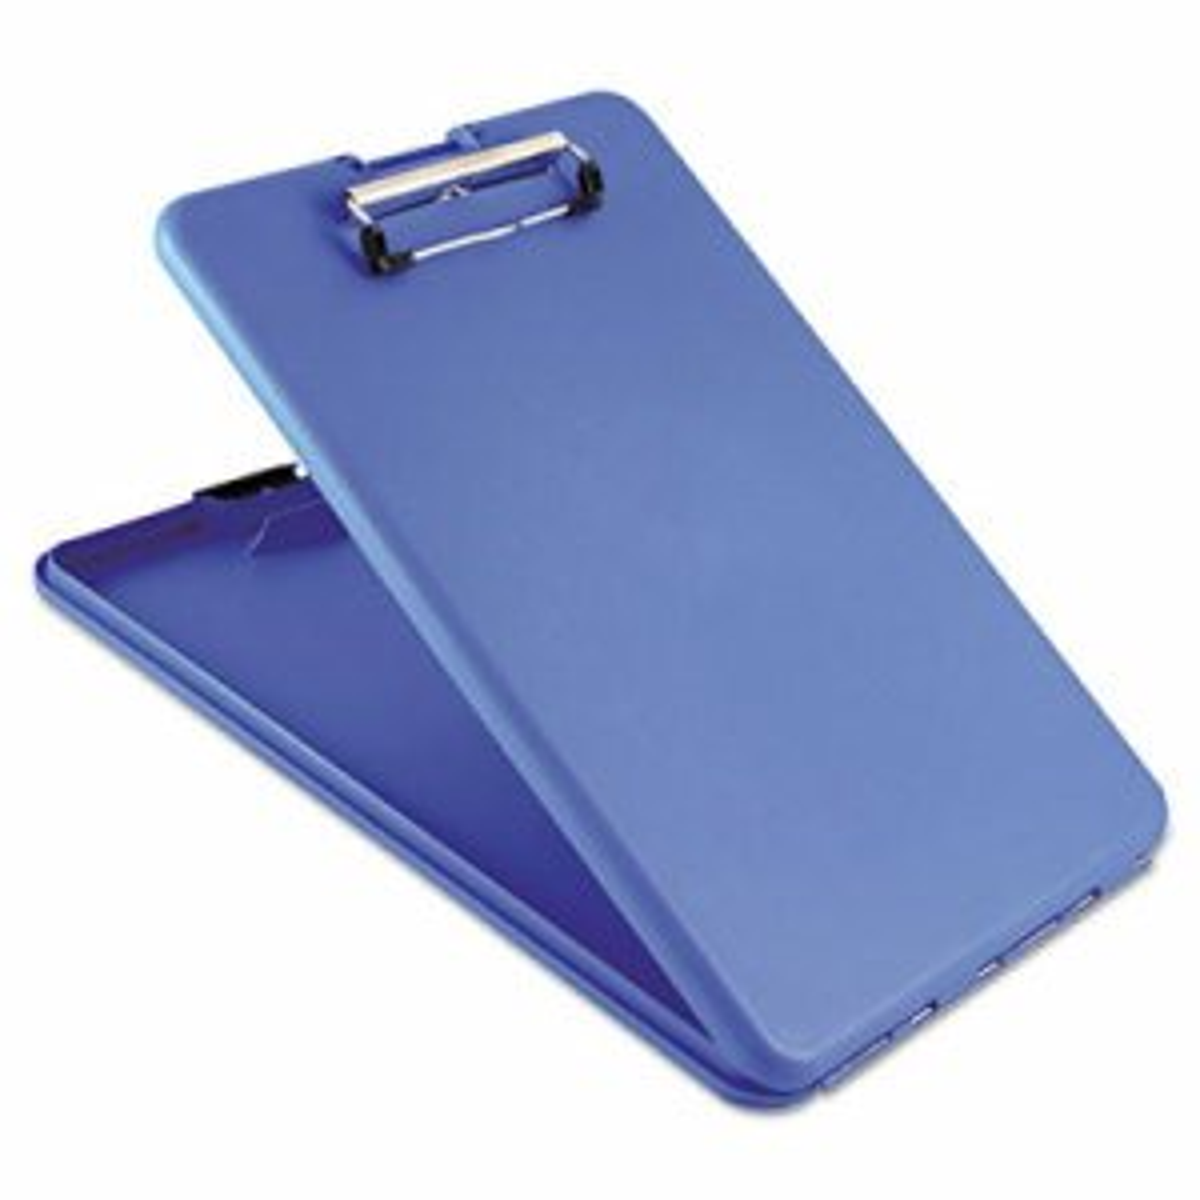 "SlimMate Storage Clipboard, 1/2"" Clip Cap, 8 1/2 x 11 Sheets, Blue"